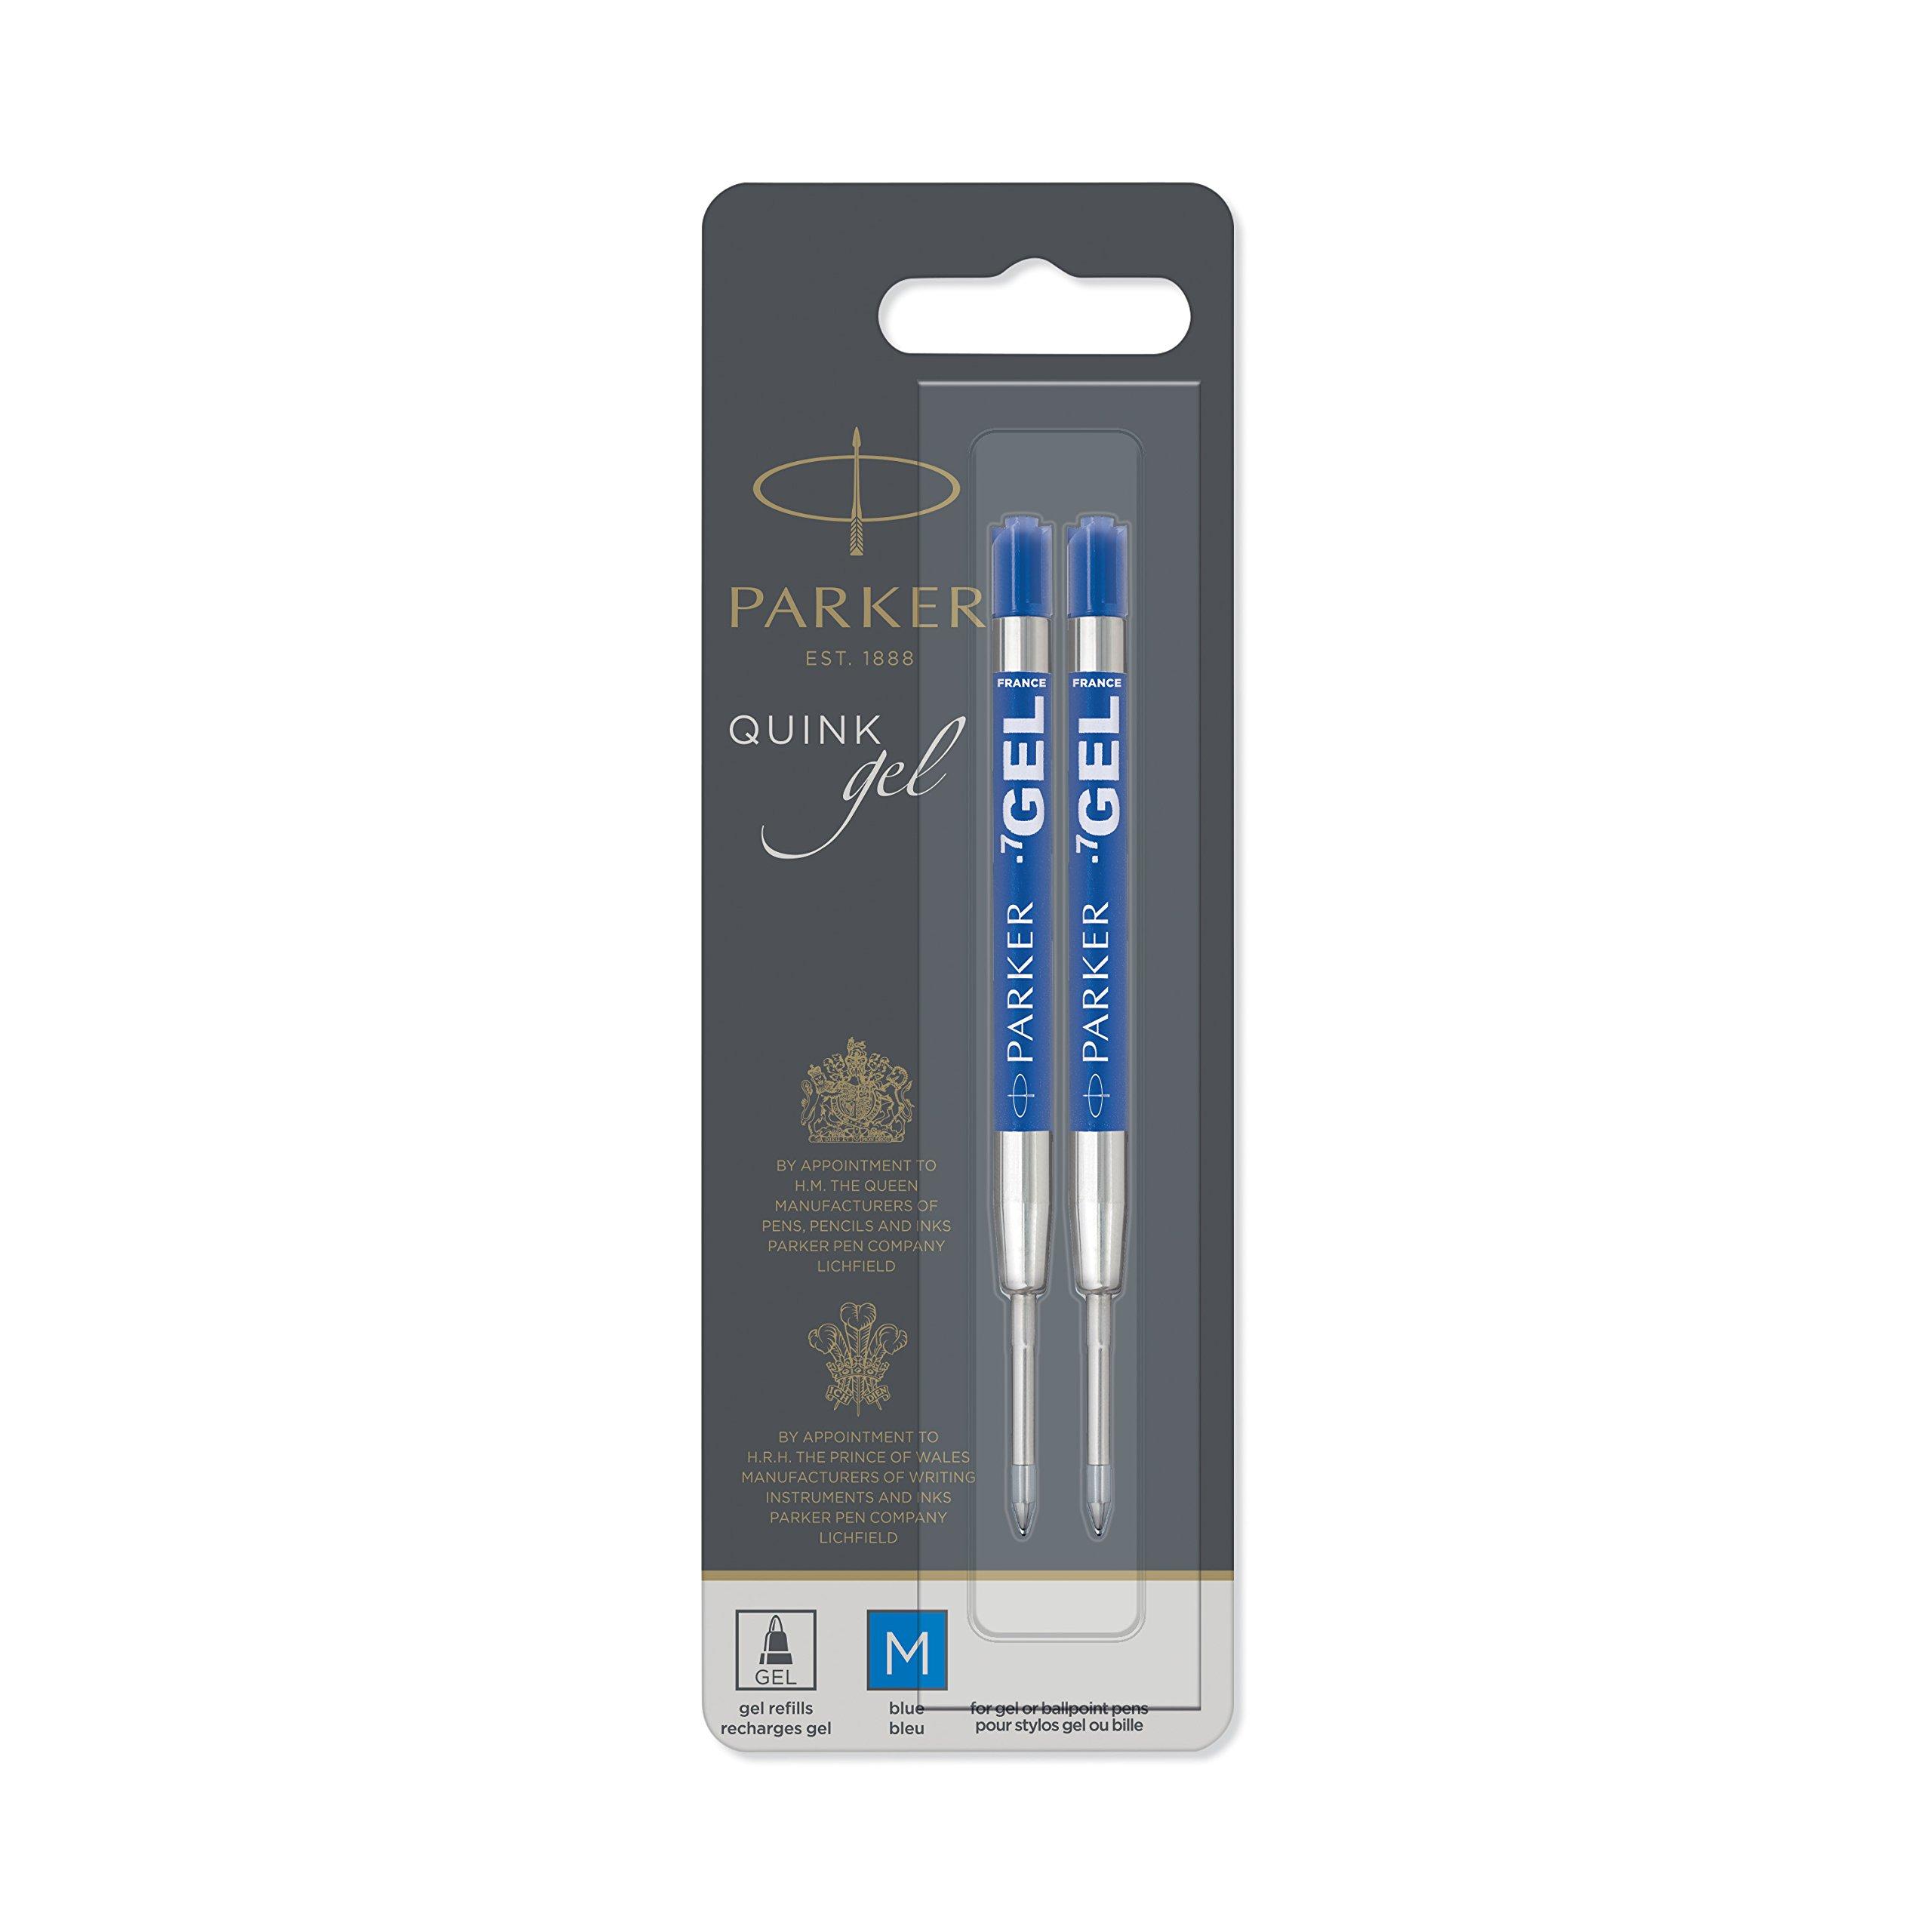 PARKER QUINK Ballpoint Pen Gel Ink Refills, Medium Tip, Blue, 2 Count